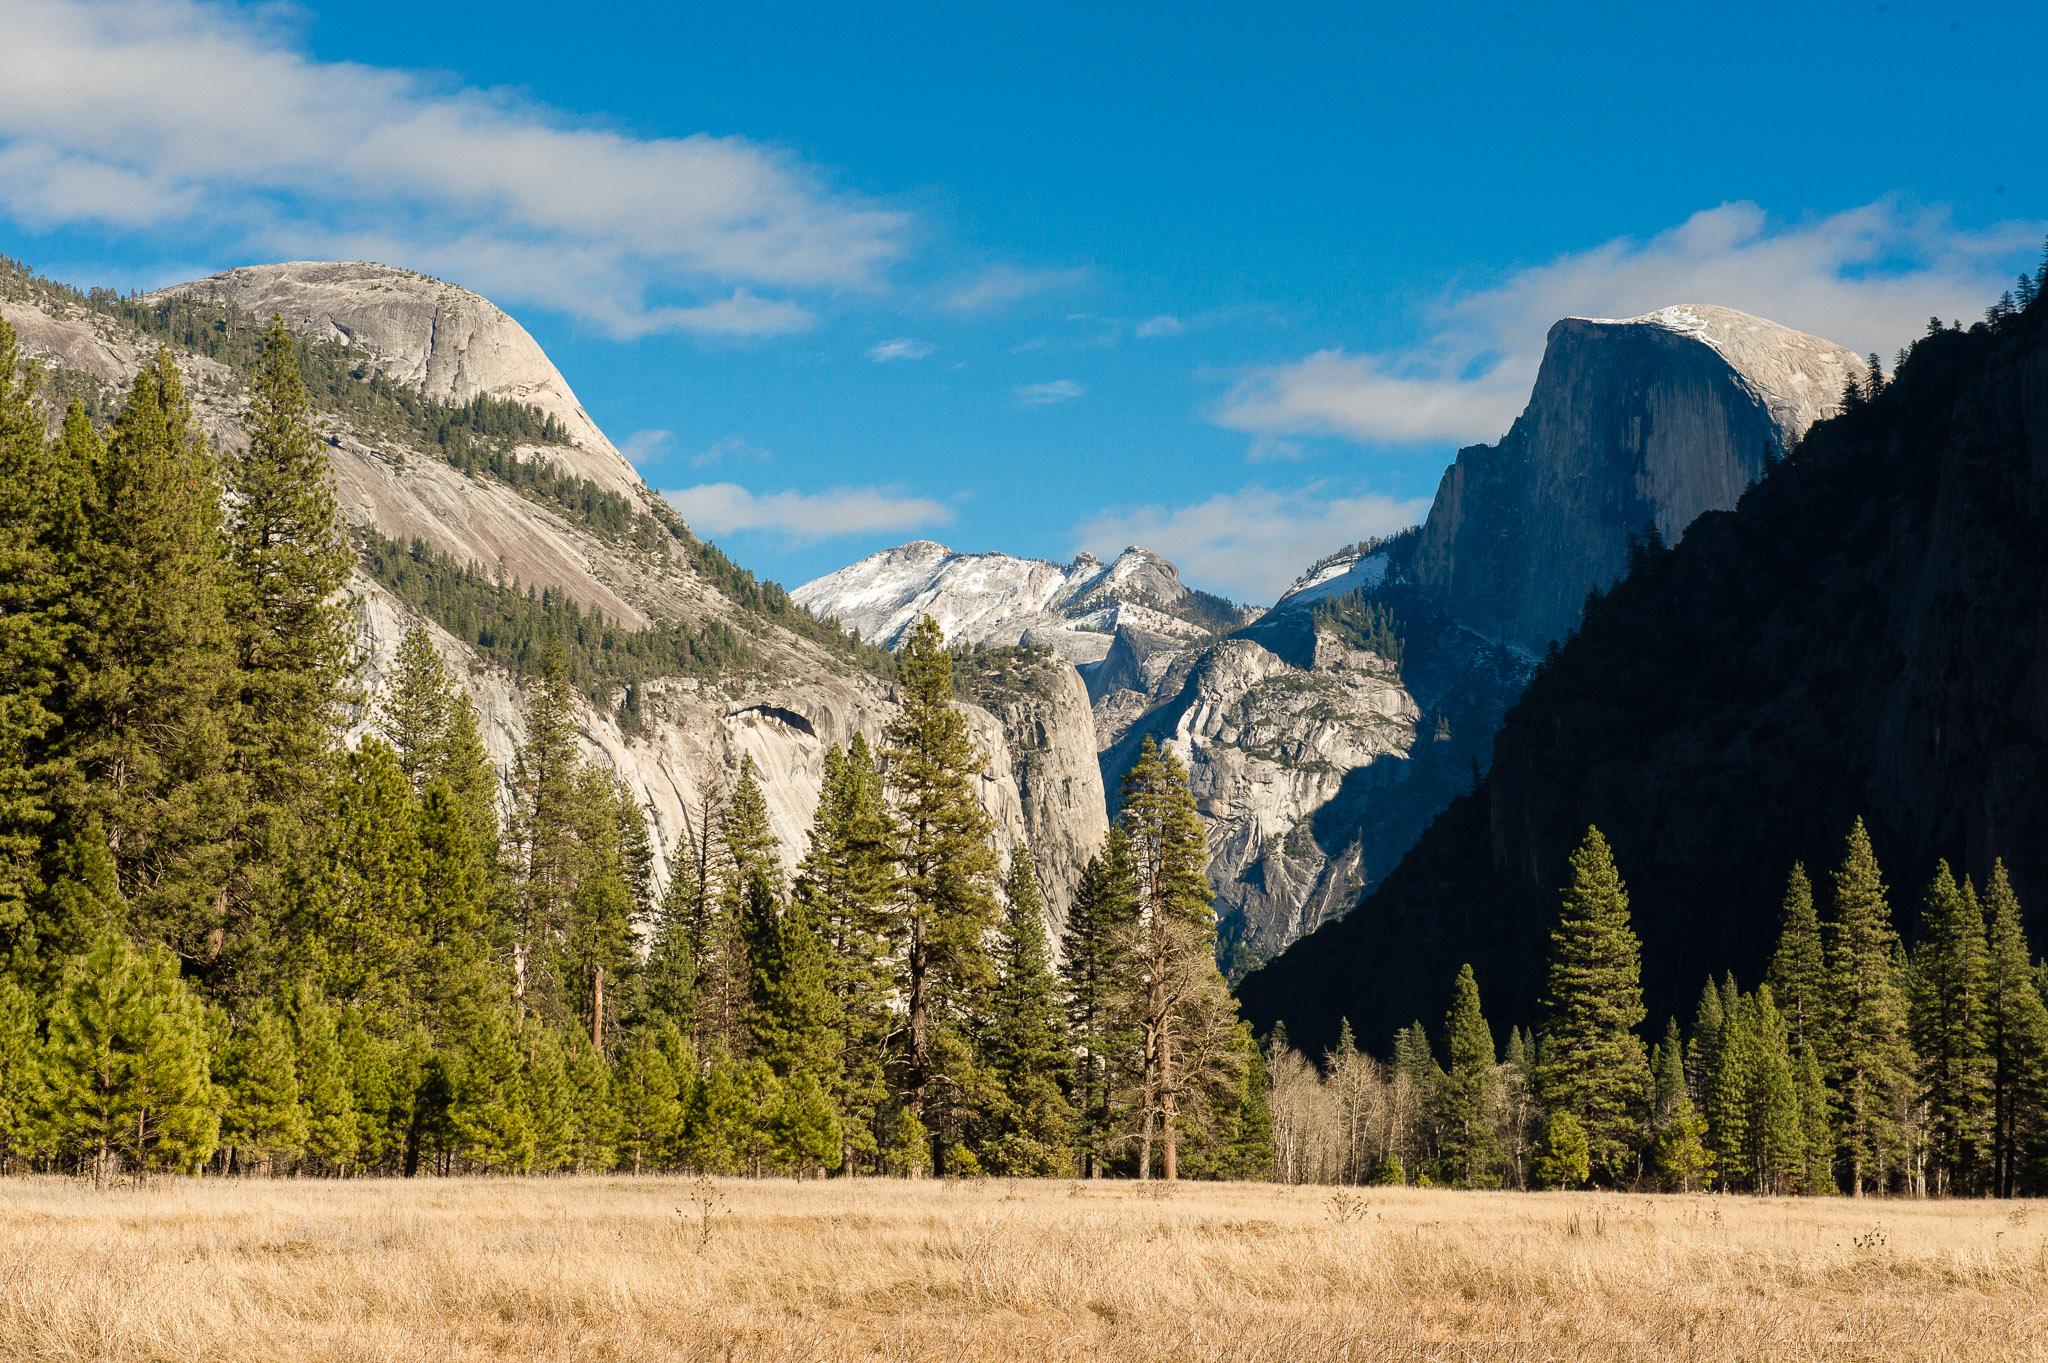 Jason-Davis-Images-Yosemite-0031.jpg